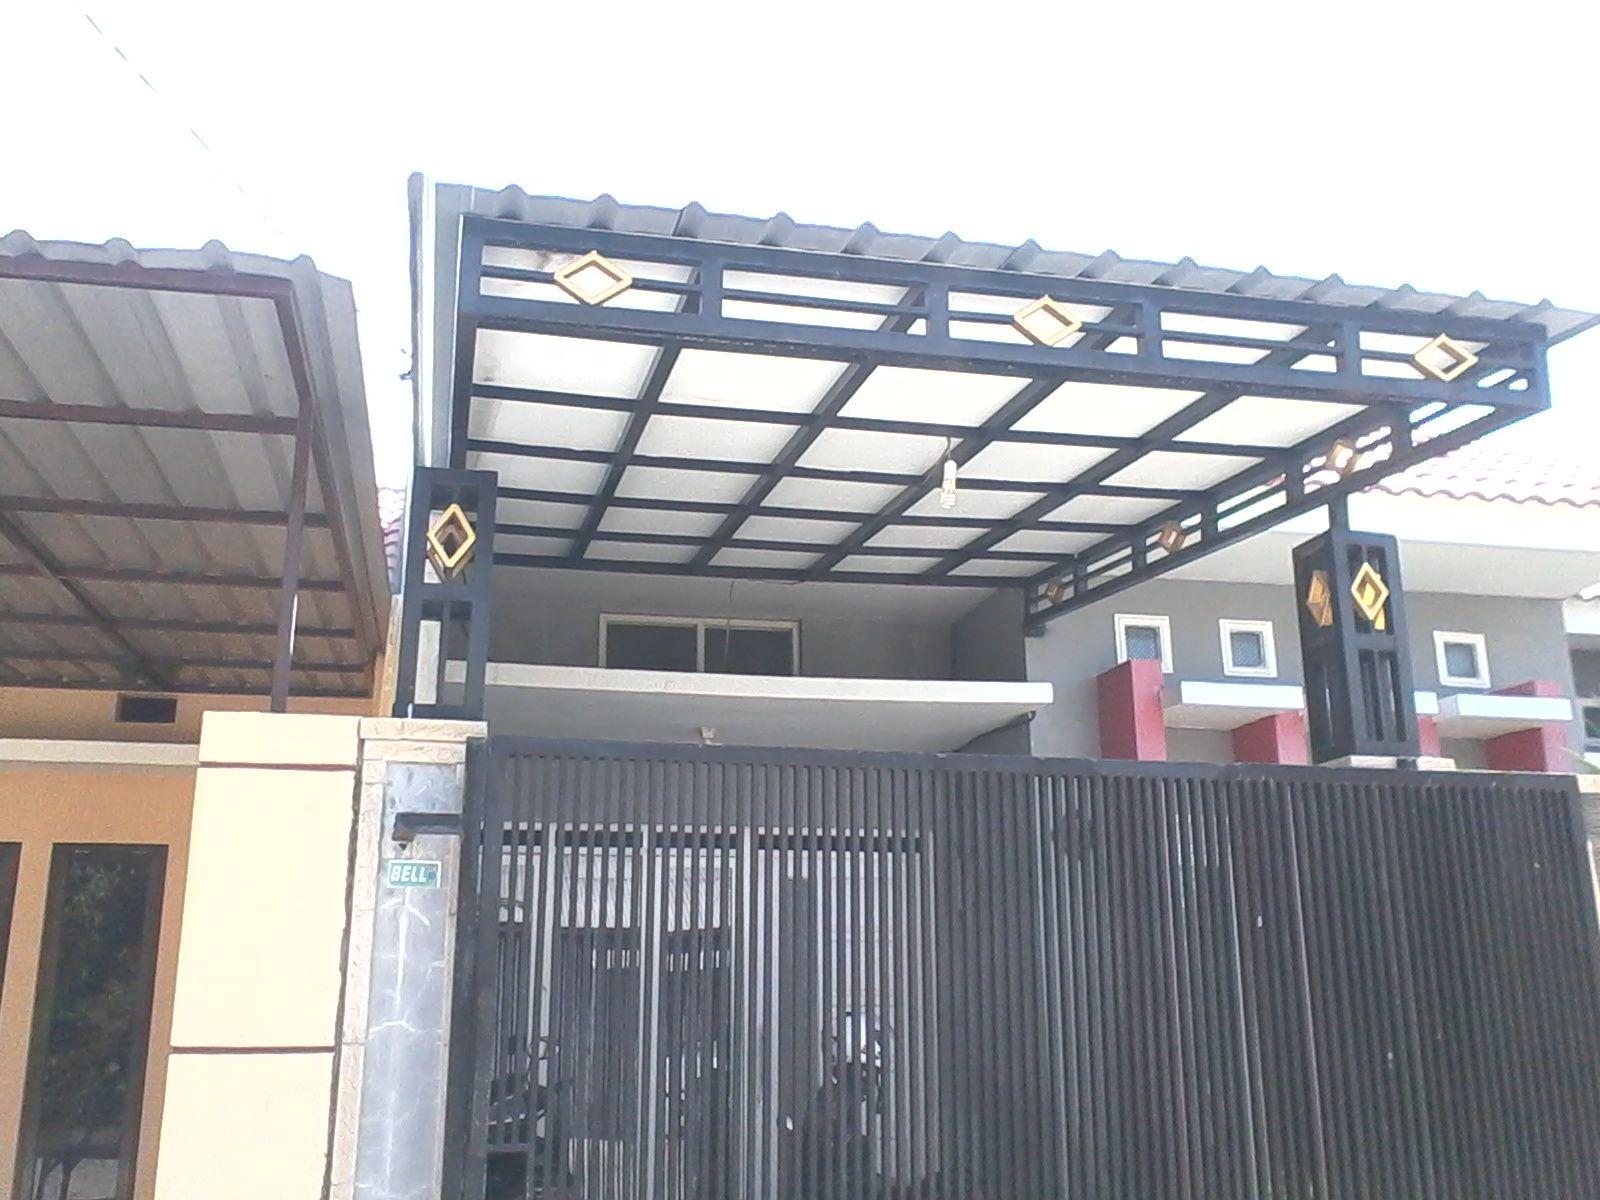 Kanopi Surabaya Besi Dengan Gambar Kanopi Rumah Teras Minimalis